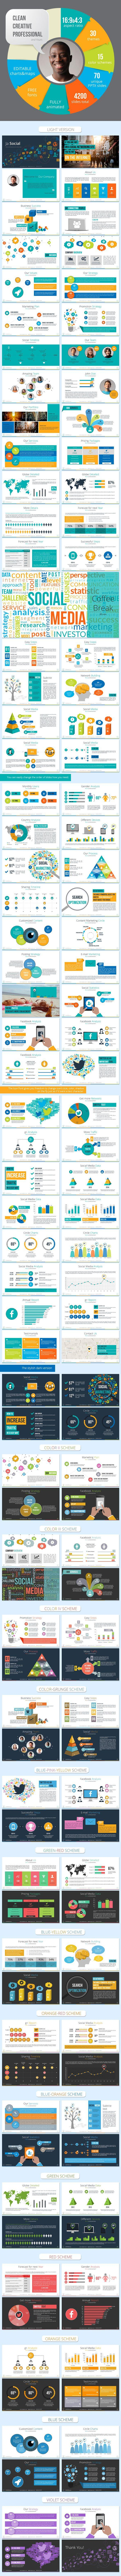 Social Media PowerPoint Presentation Template http://graphicriver.net/item/social-media-ja-powerpoint-presentation-template/9274859